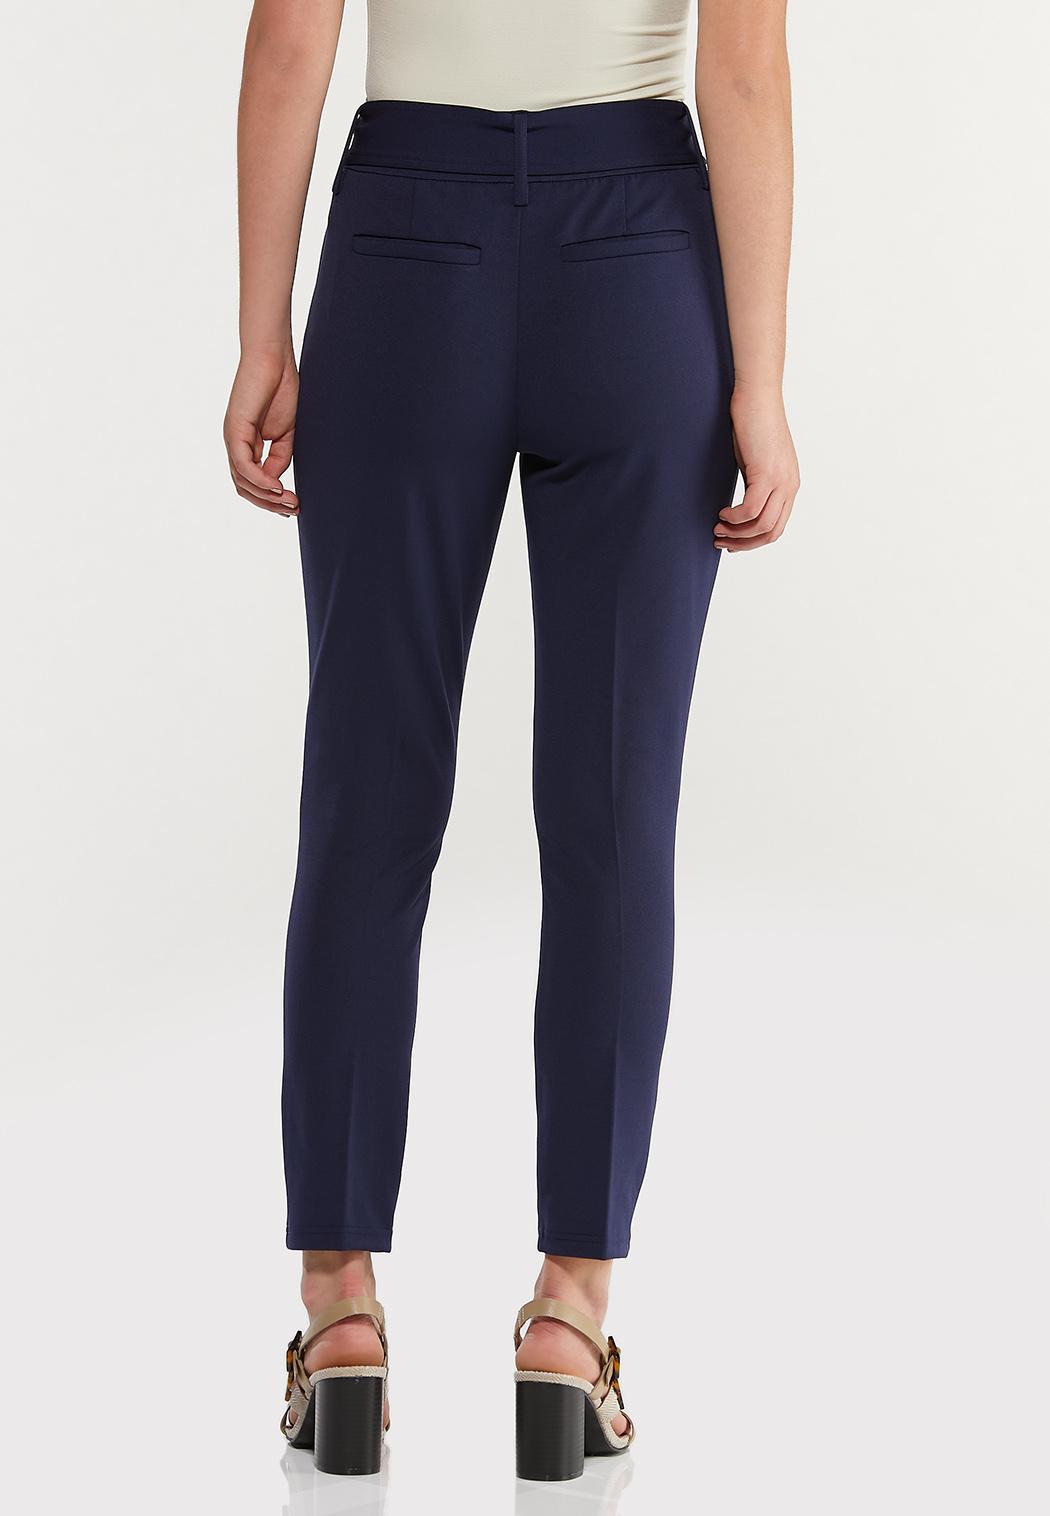 Belted Slim Pants (Item #44470061)